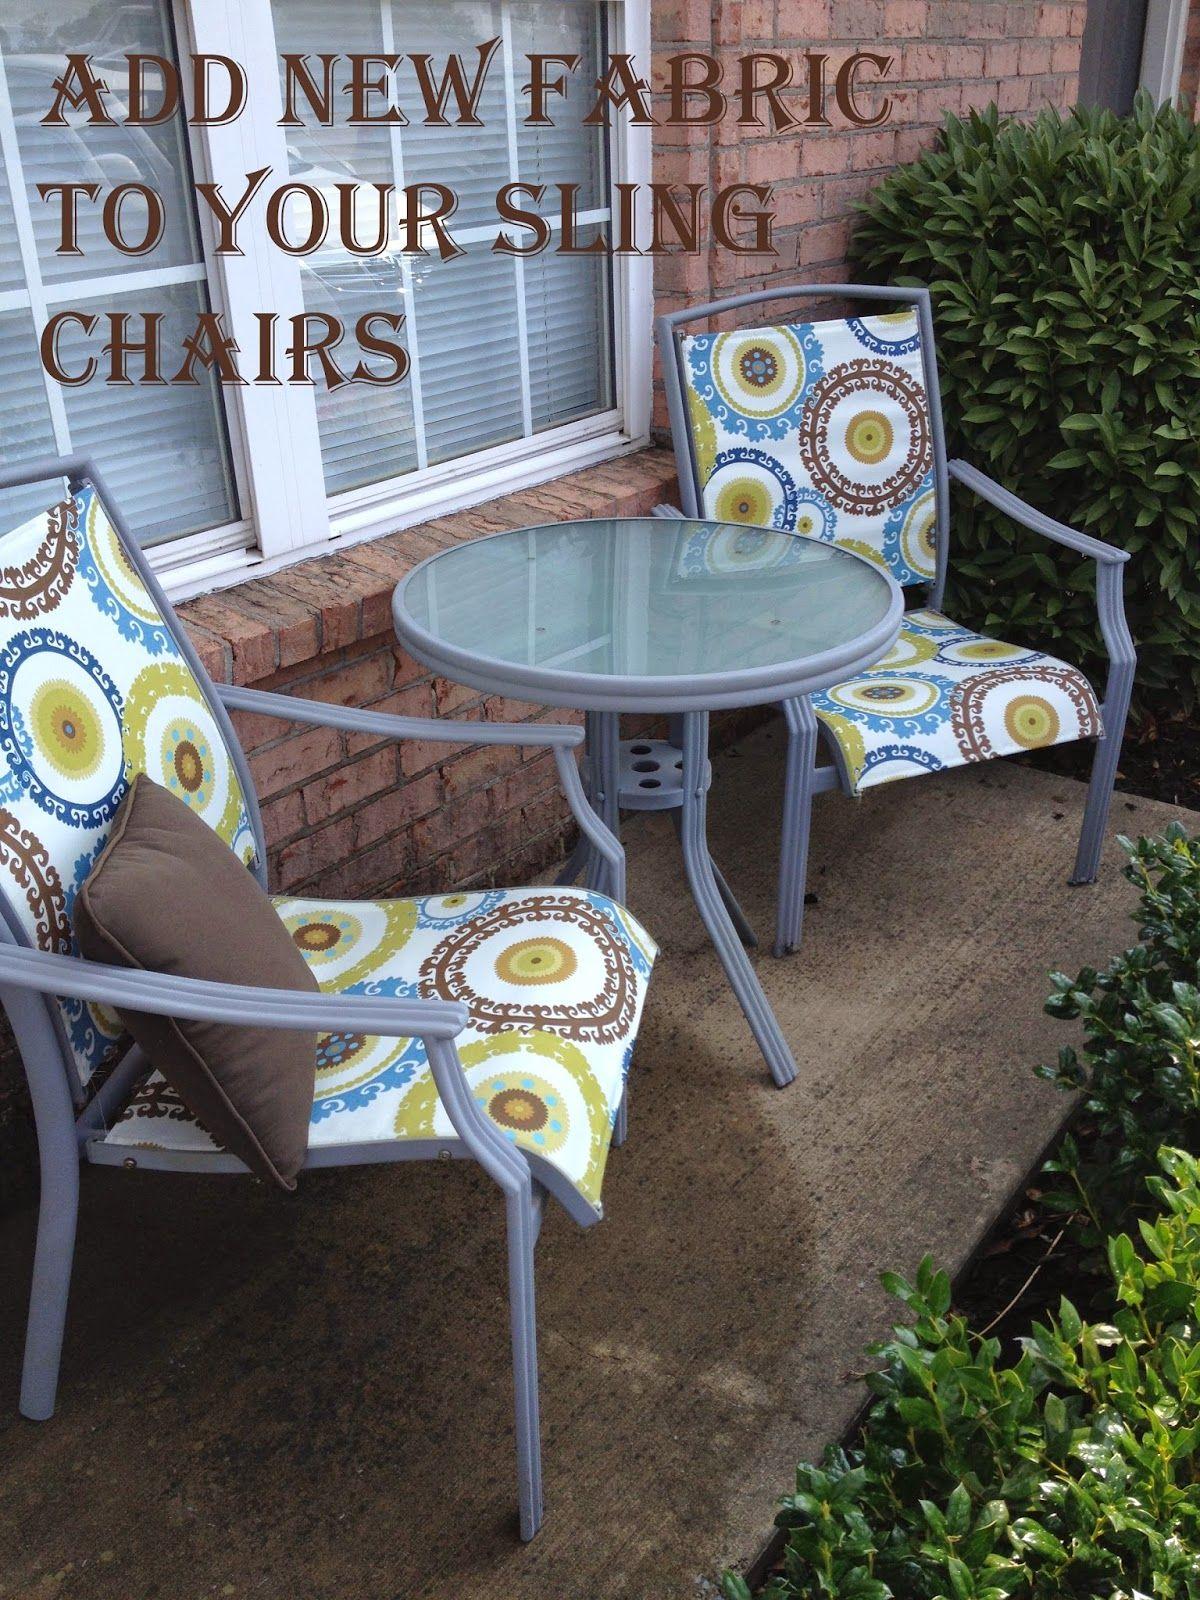 Sensational Redo Patio Sling Chairs For Under 25 Patio Set Redo Spiritservingveterans Wood Chair Design Ideas Spiritservingveteransorg